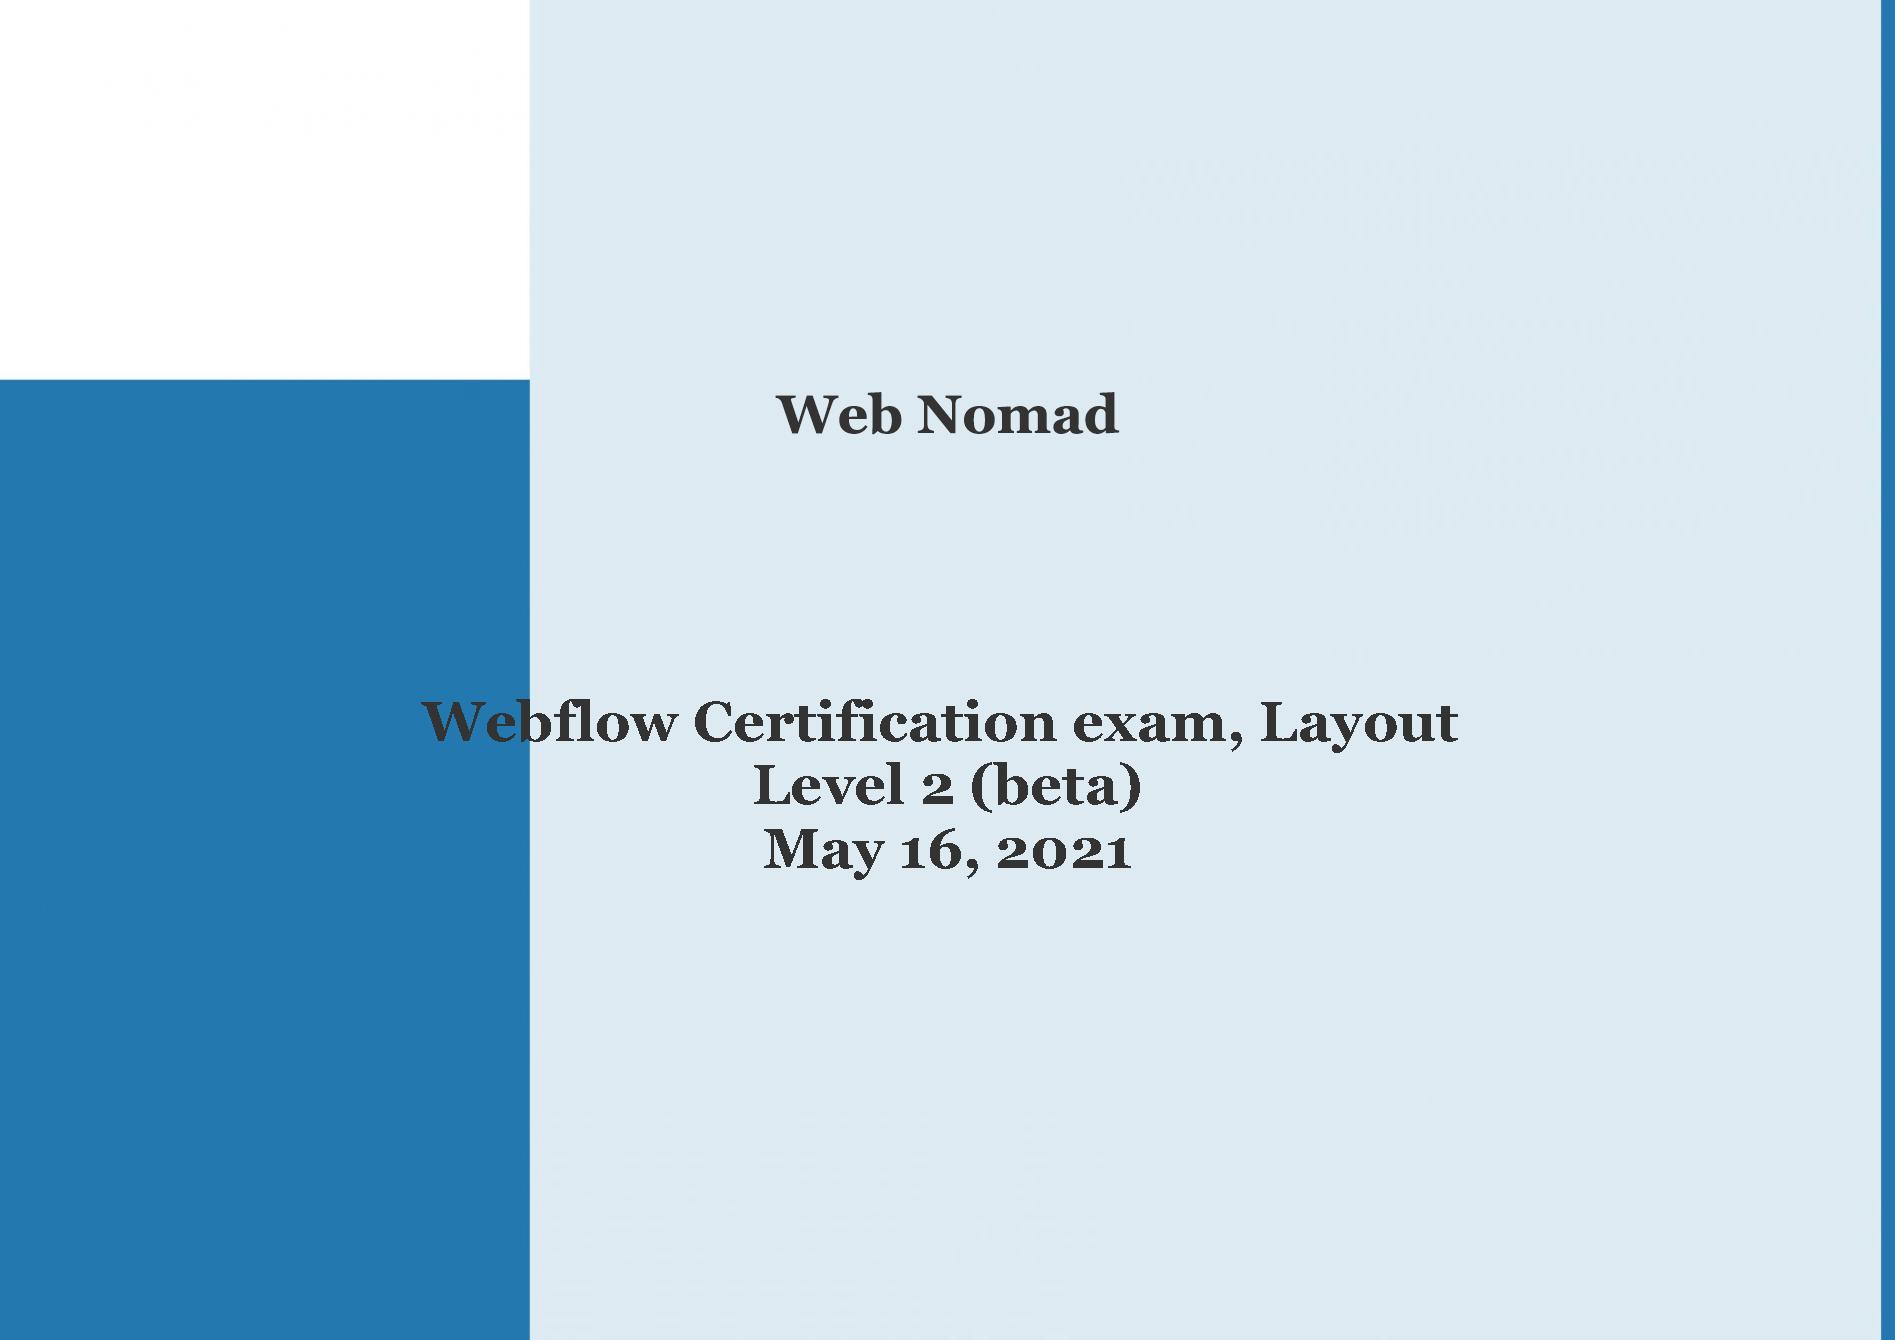 Web Nomad Certification 2